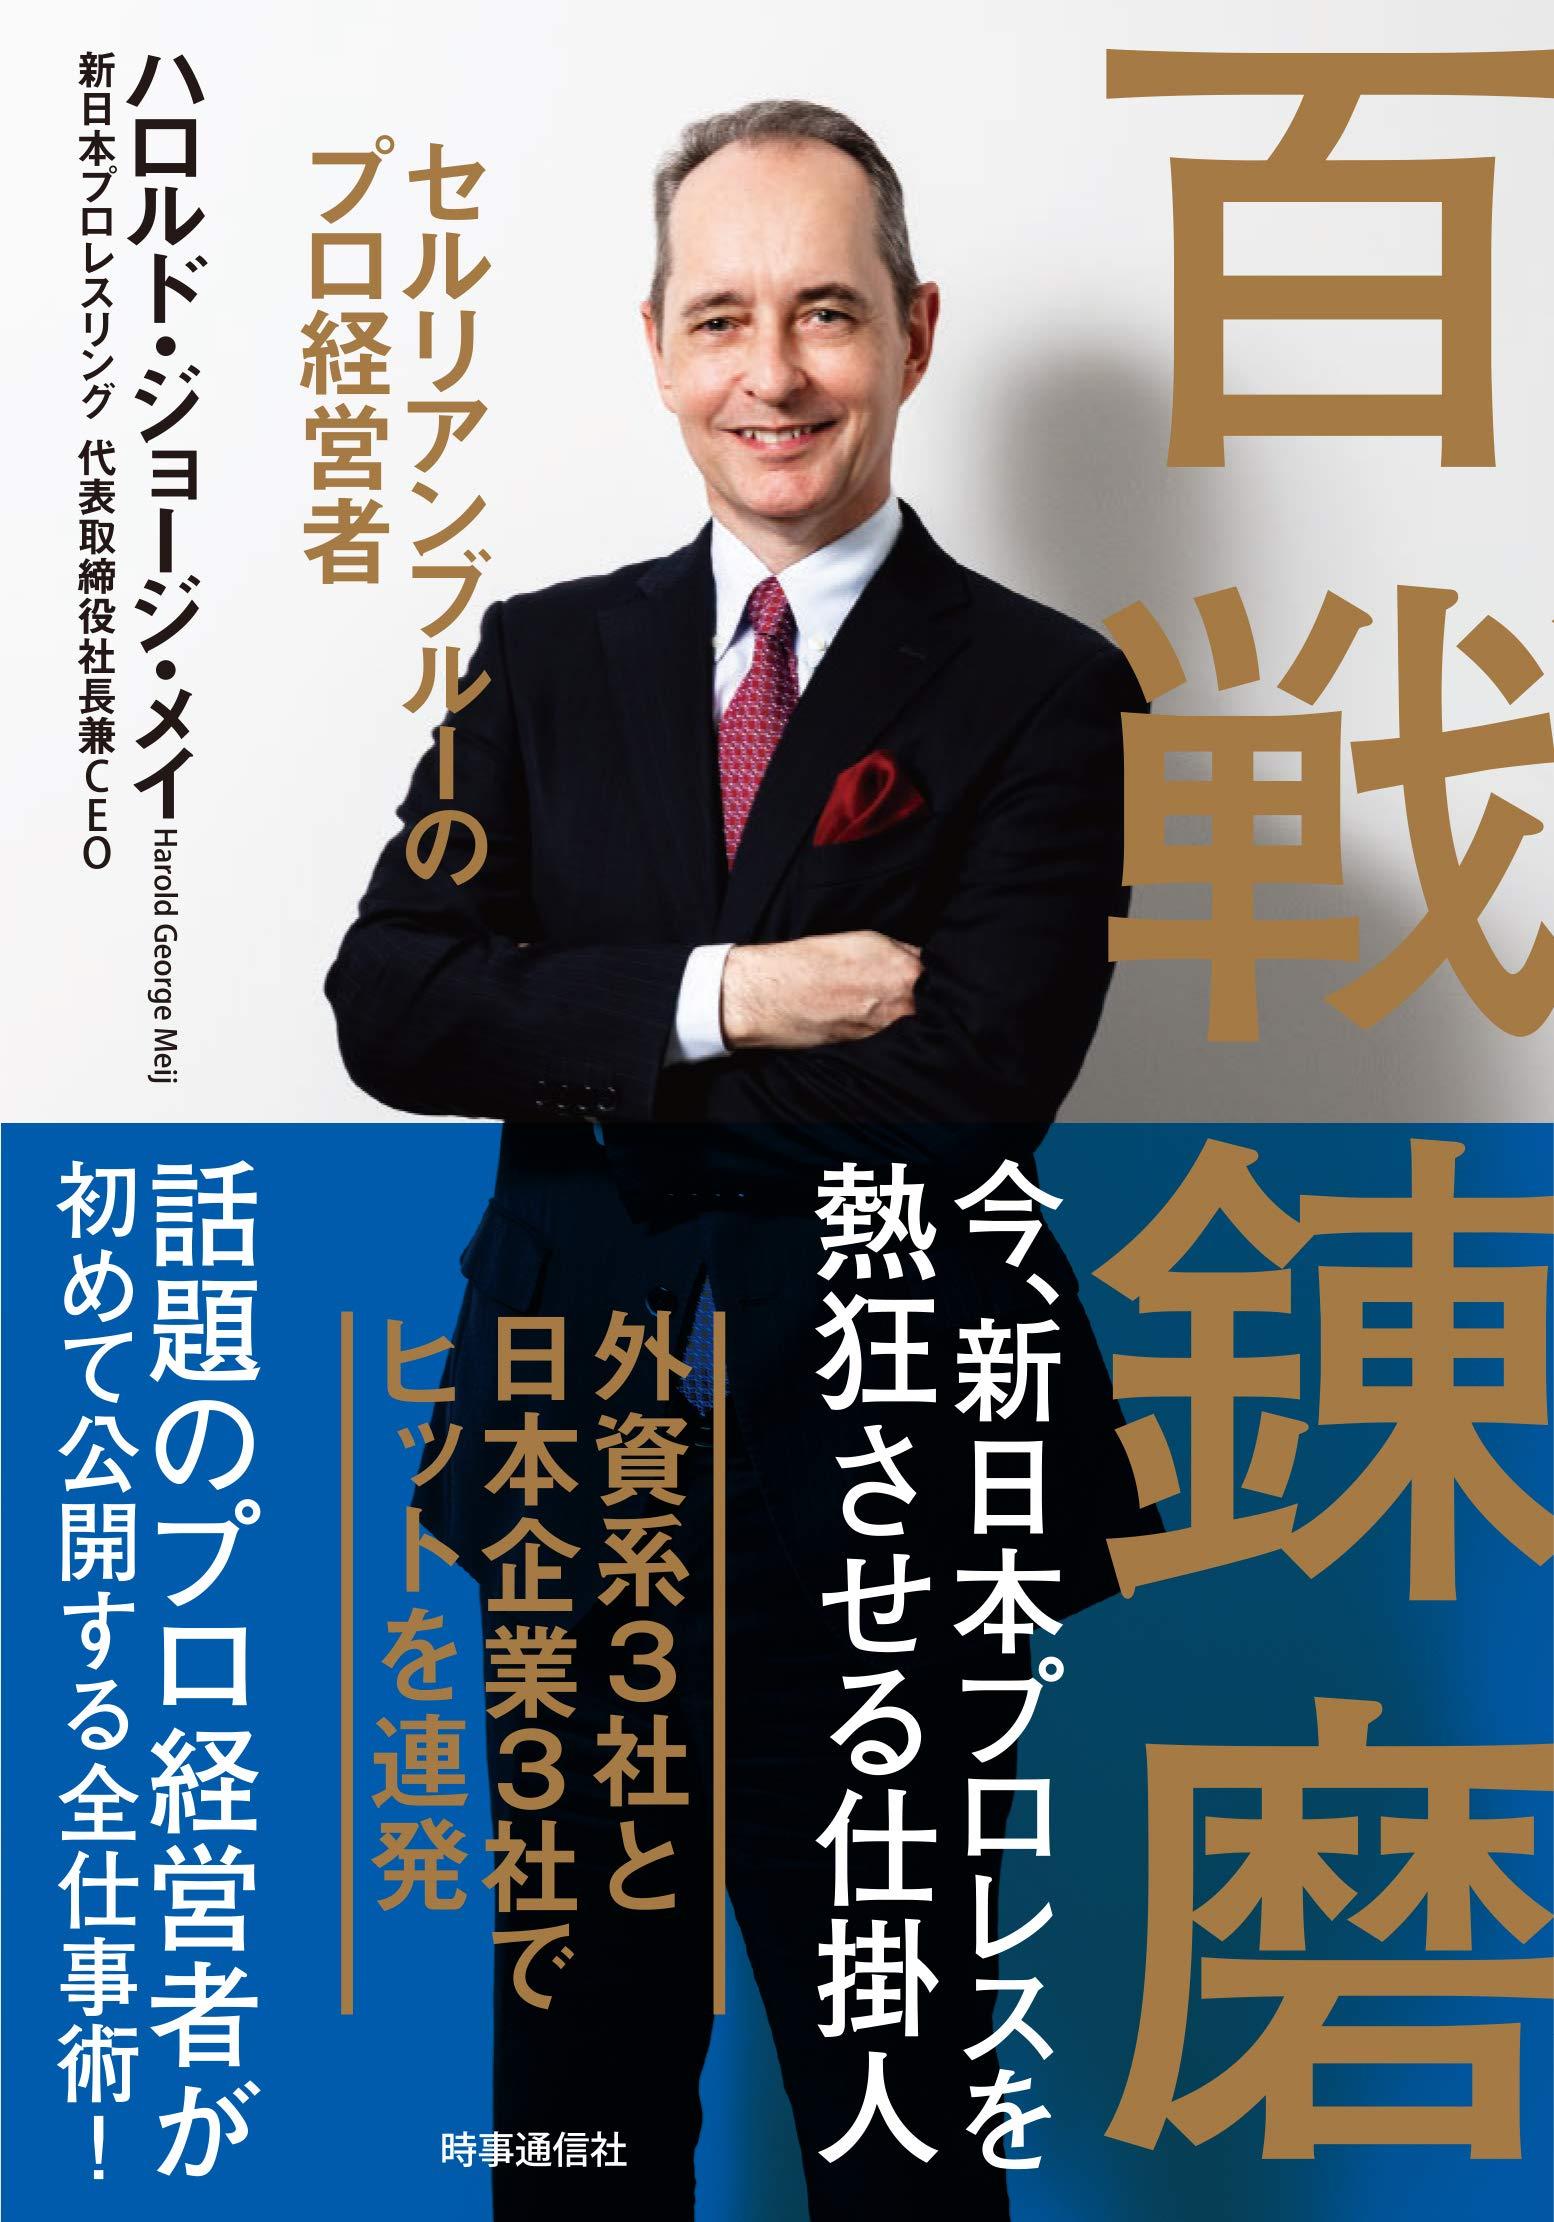 Amazon.co.jp: 百戦錬磨 :セルリアンブルーのプロ経営者: ハロルド・ジョージ・メイ: 本